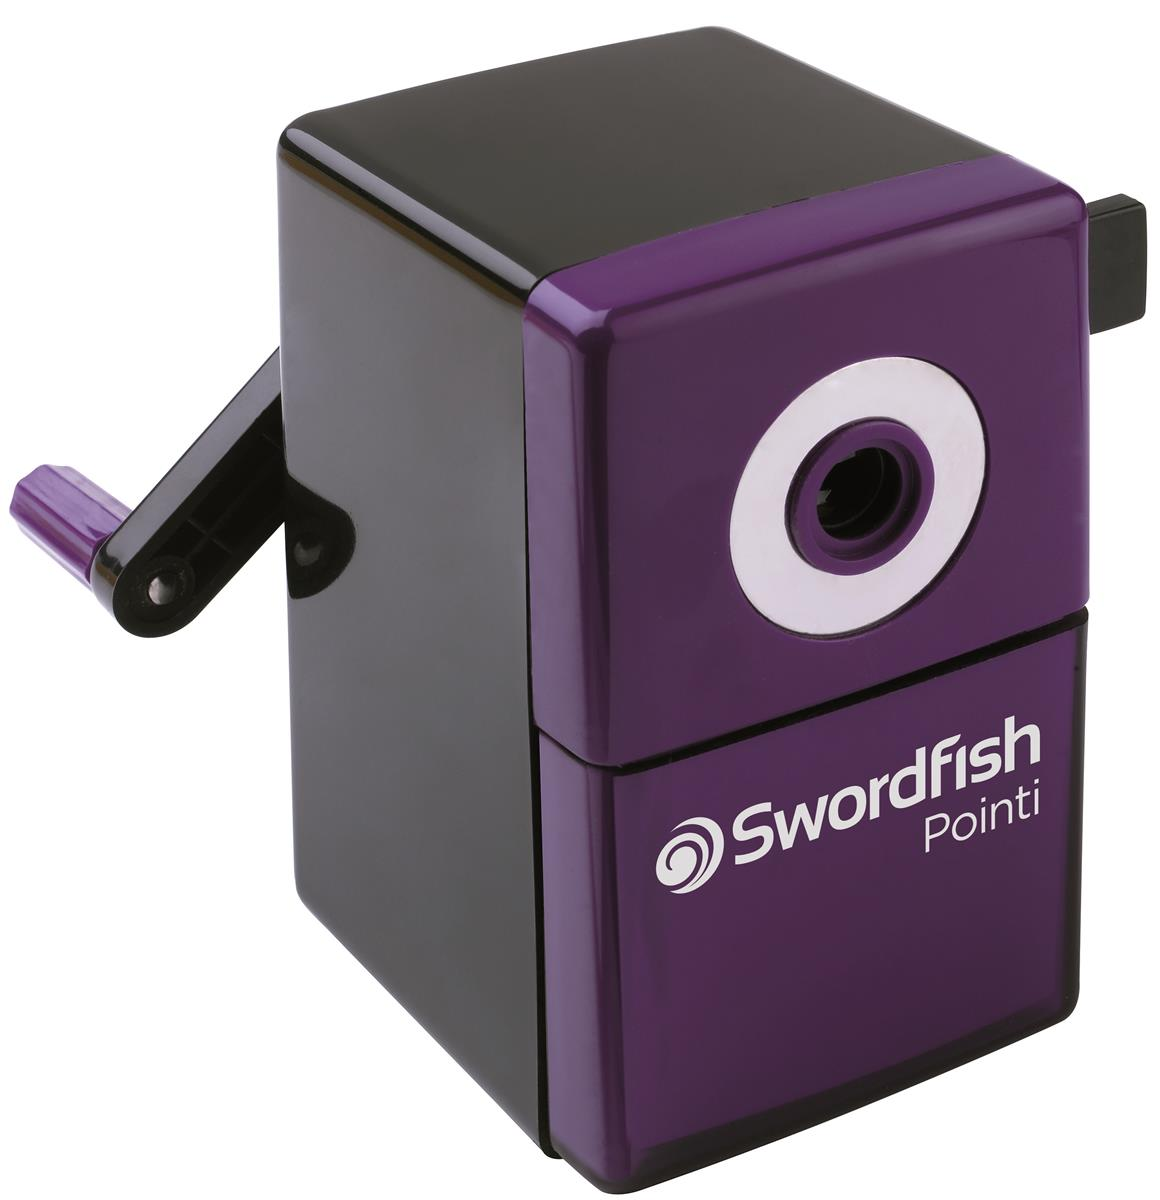 Image for Swordfish Pointi Mechanical Pencil Sharpener Auto-stop 8mm dia. Desk Clamp Black/Purple Ref 40235